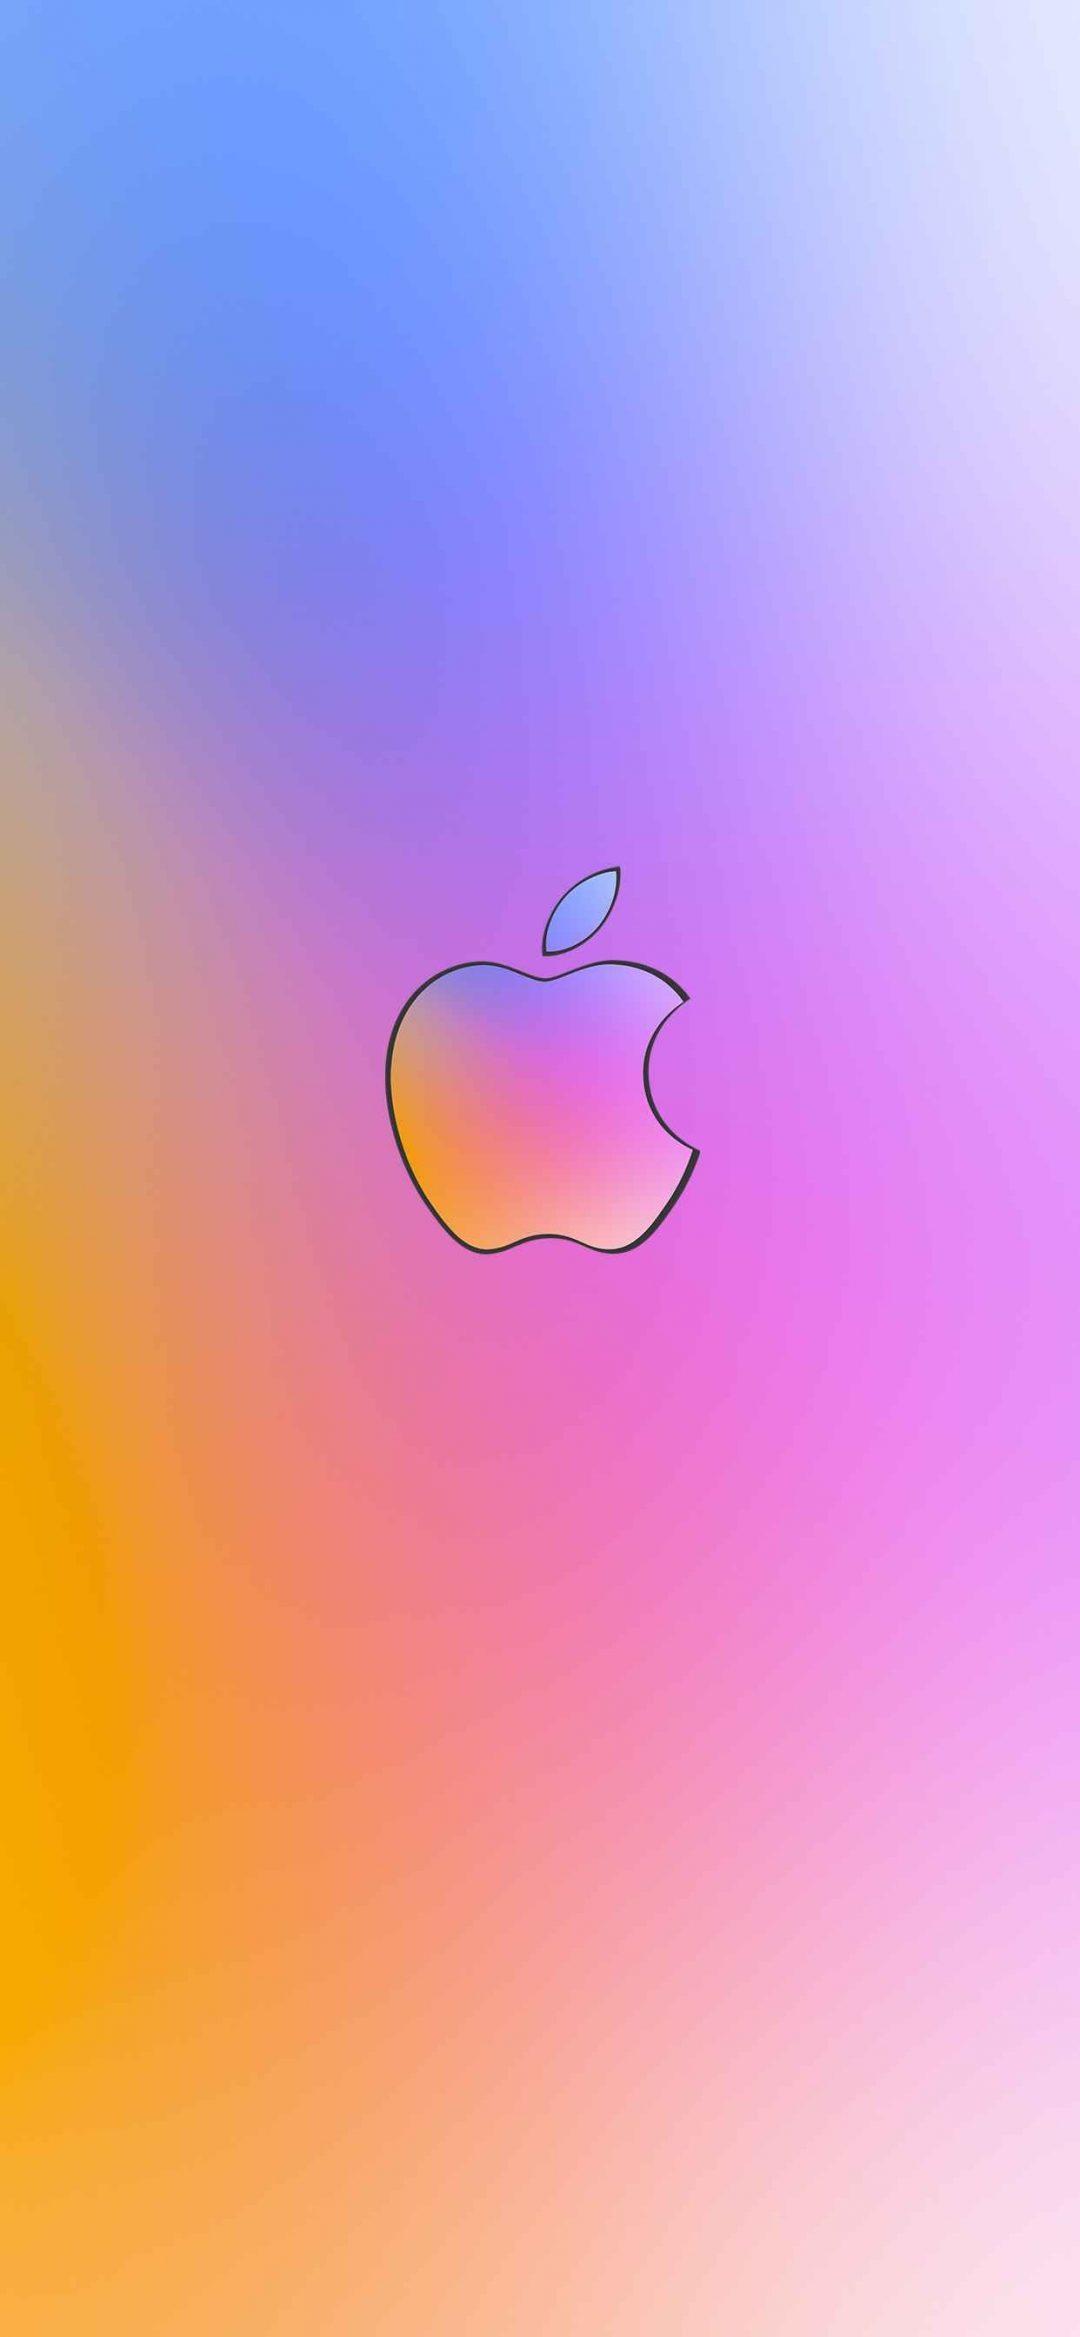 apple small logo wallpaper